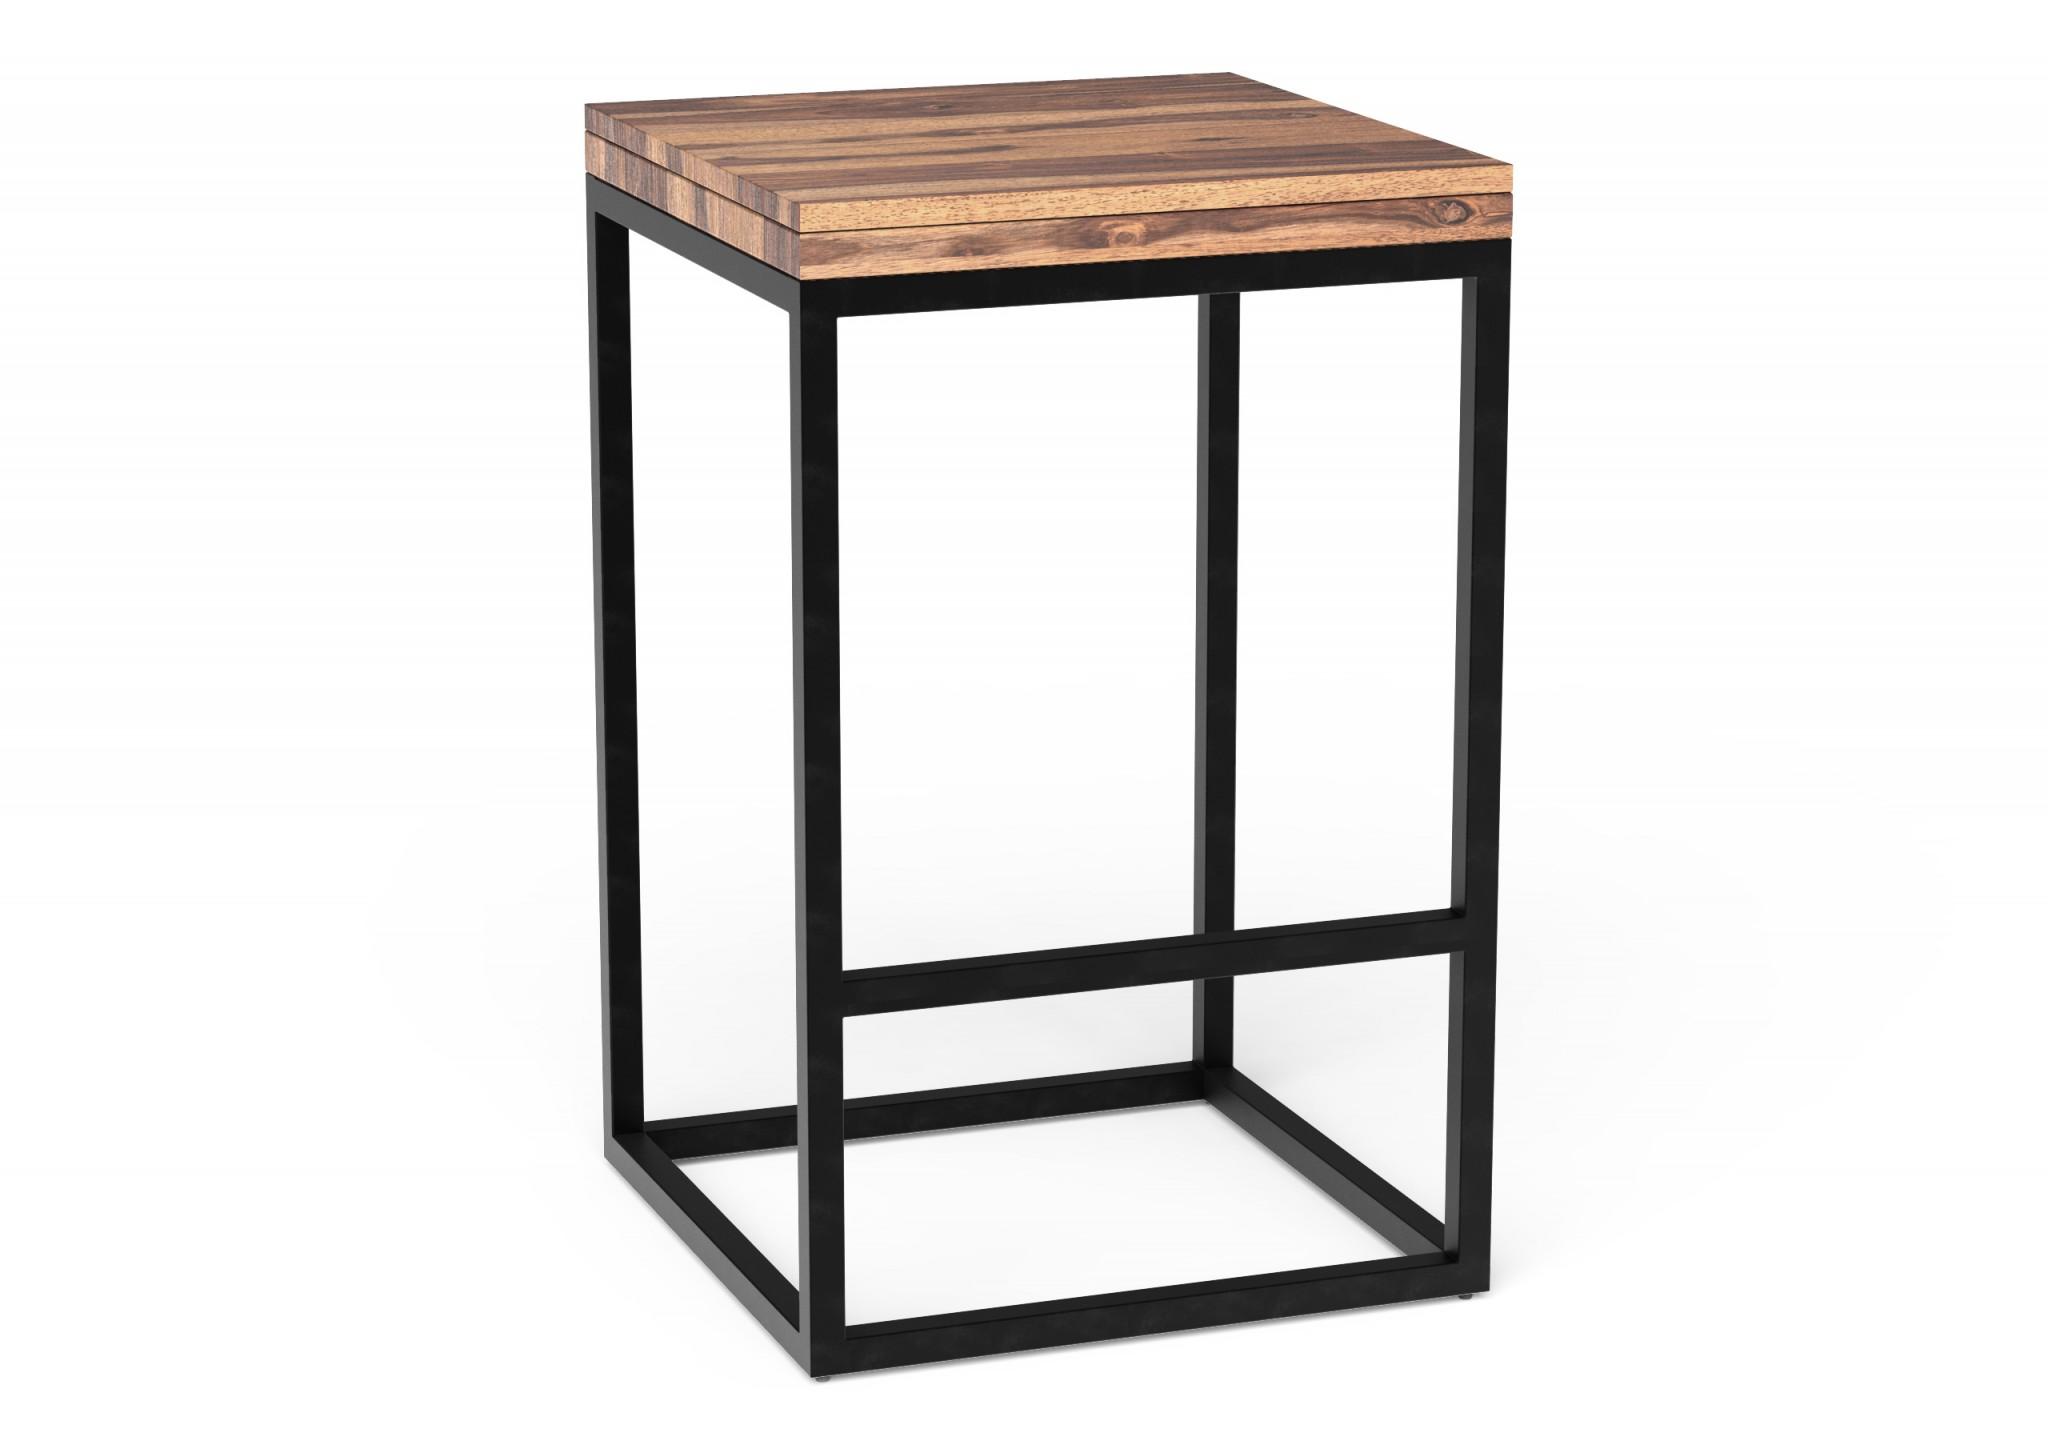 Sheesham Wooden Seat with Black Bar Stool